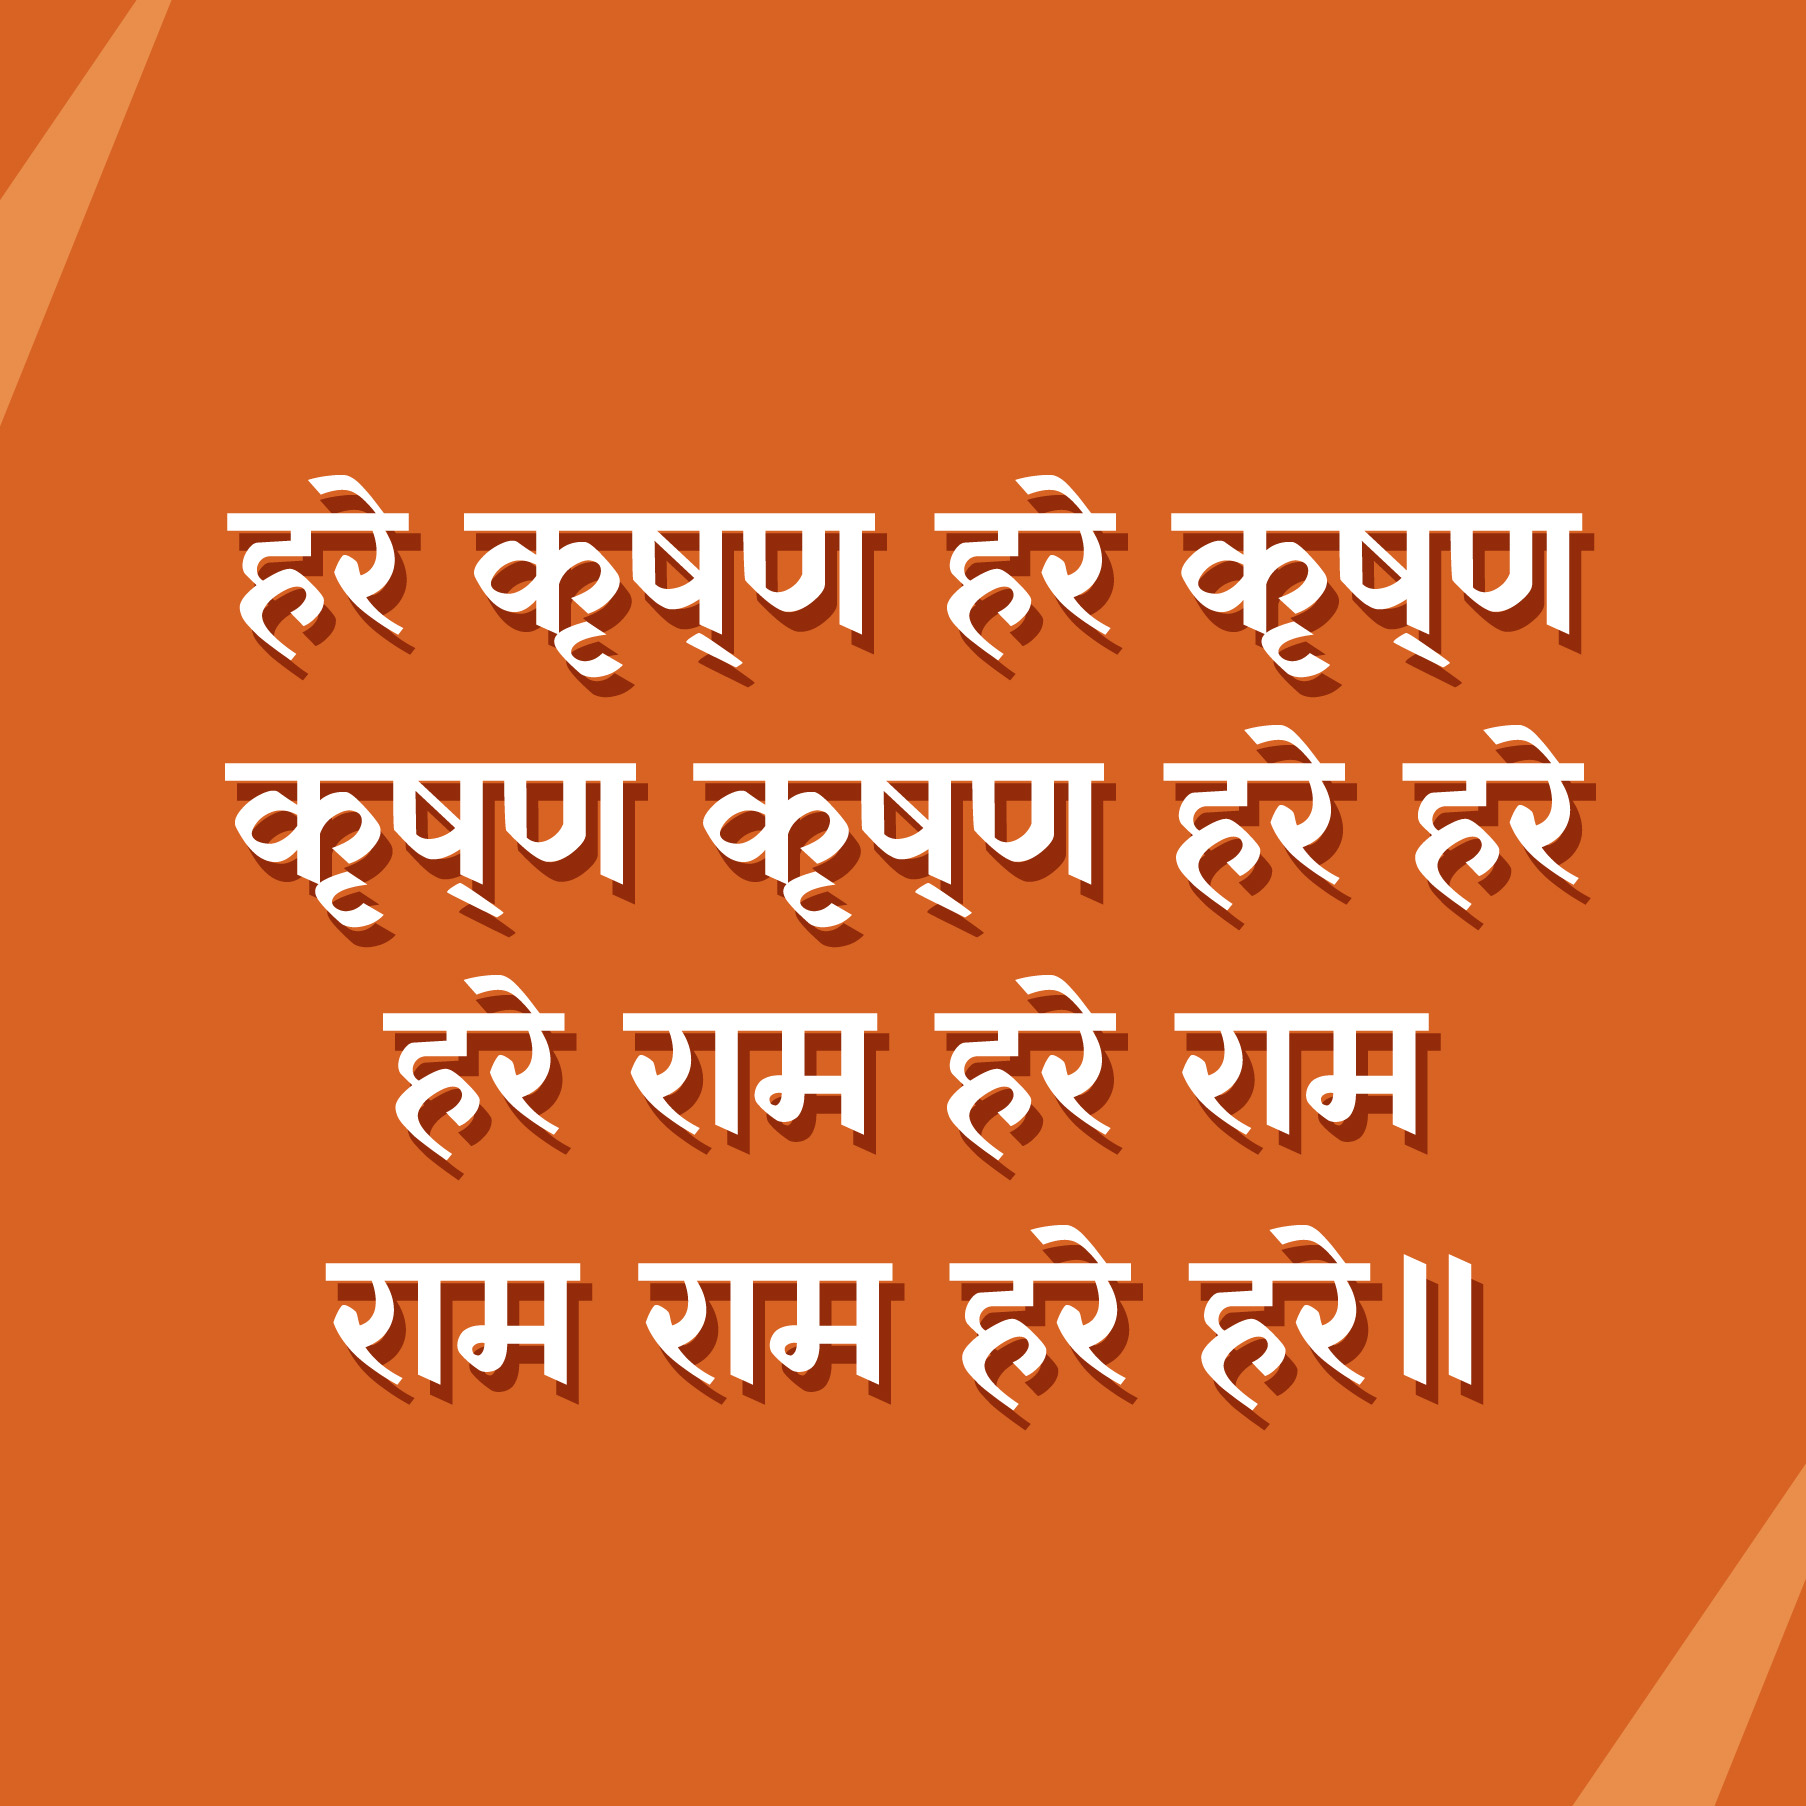 Hare Krishna (mantra) - Wikipedia